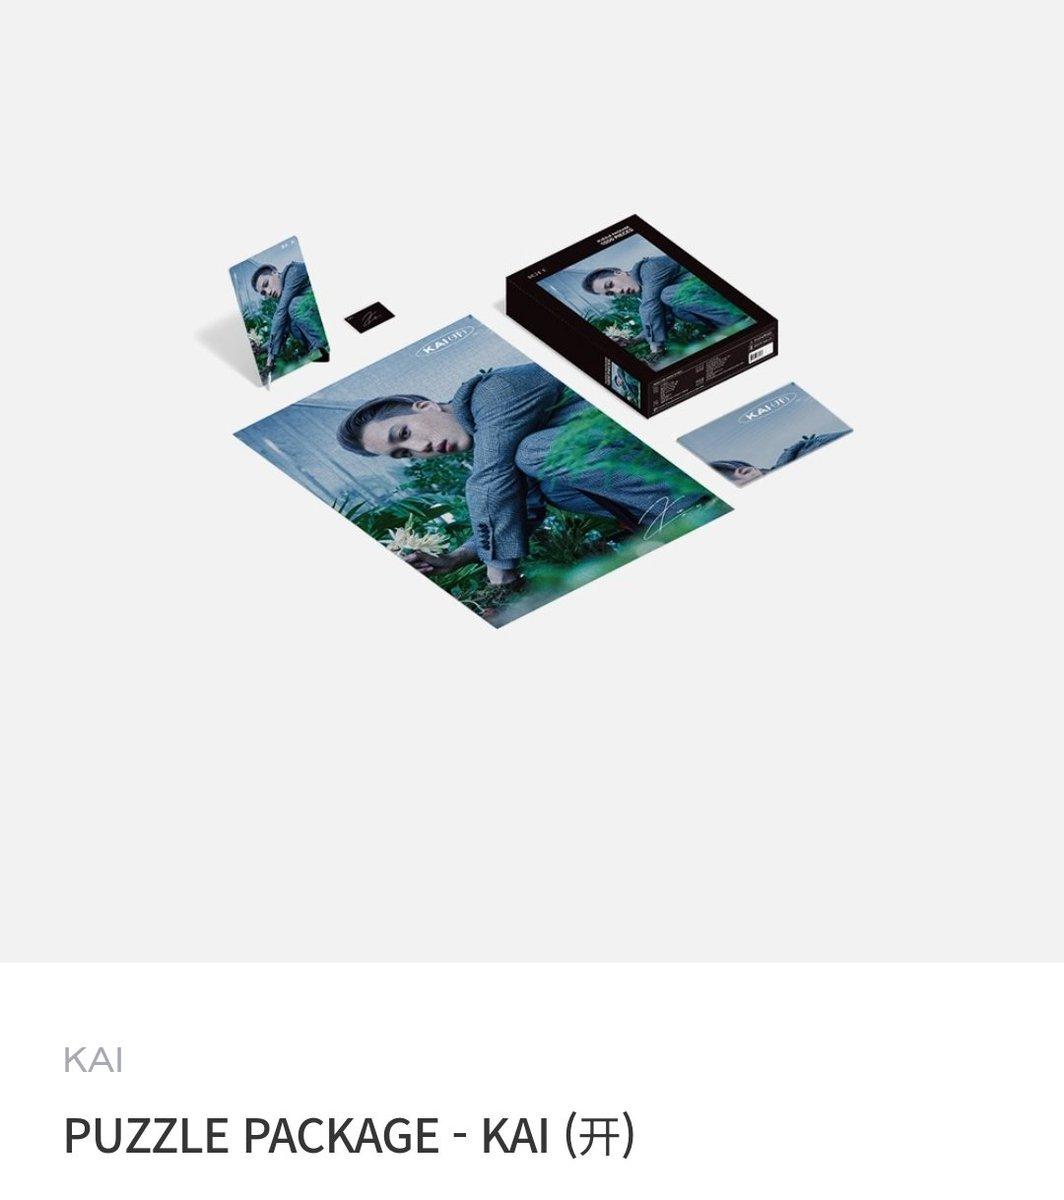 KAI 1st Solo KAI(开) MD🎵  퍼즐패키지 👉  교통카드 👉  #엑소카이 #카이 #KAI #엑소 #EXO #开 #Mmmh @weareoneEXO